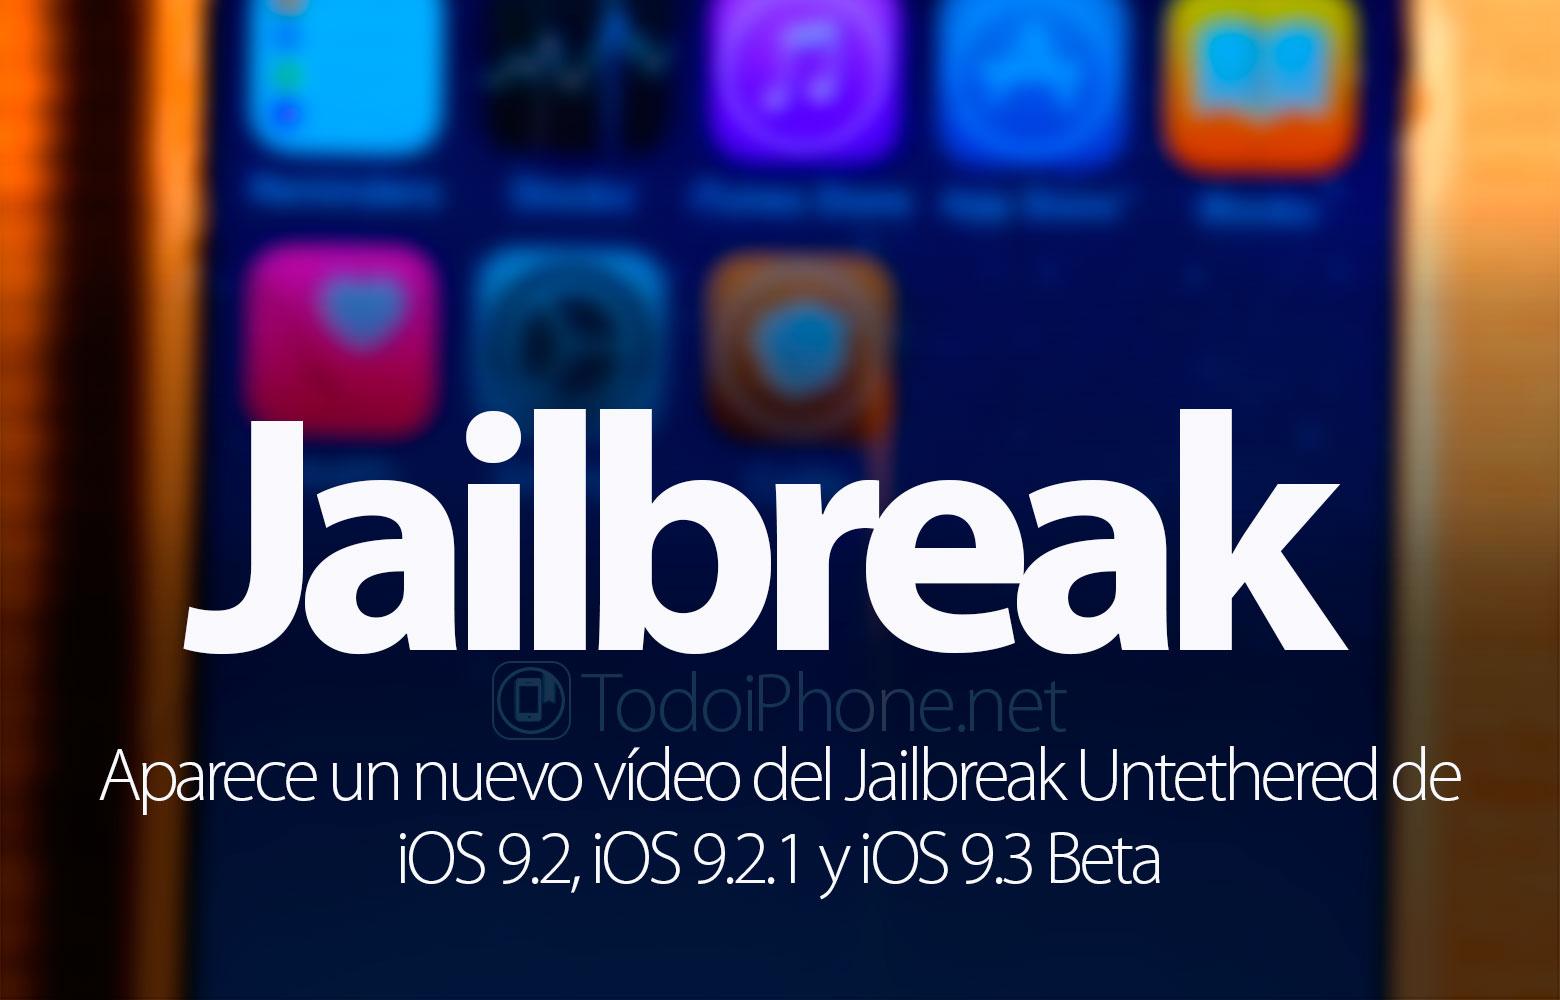 jailbreak-untethered-ios-9-2-9-2-1-9-3-beta-nuevo-video